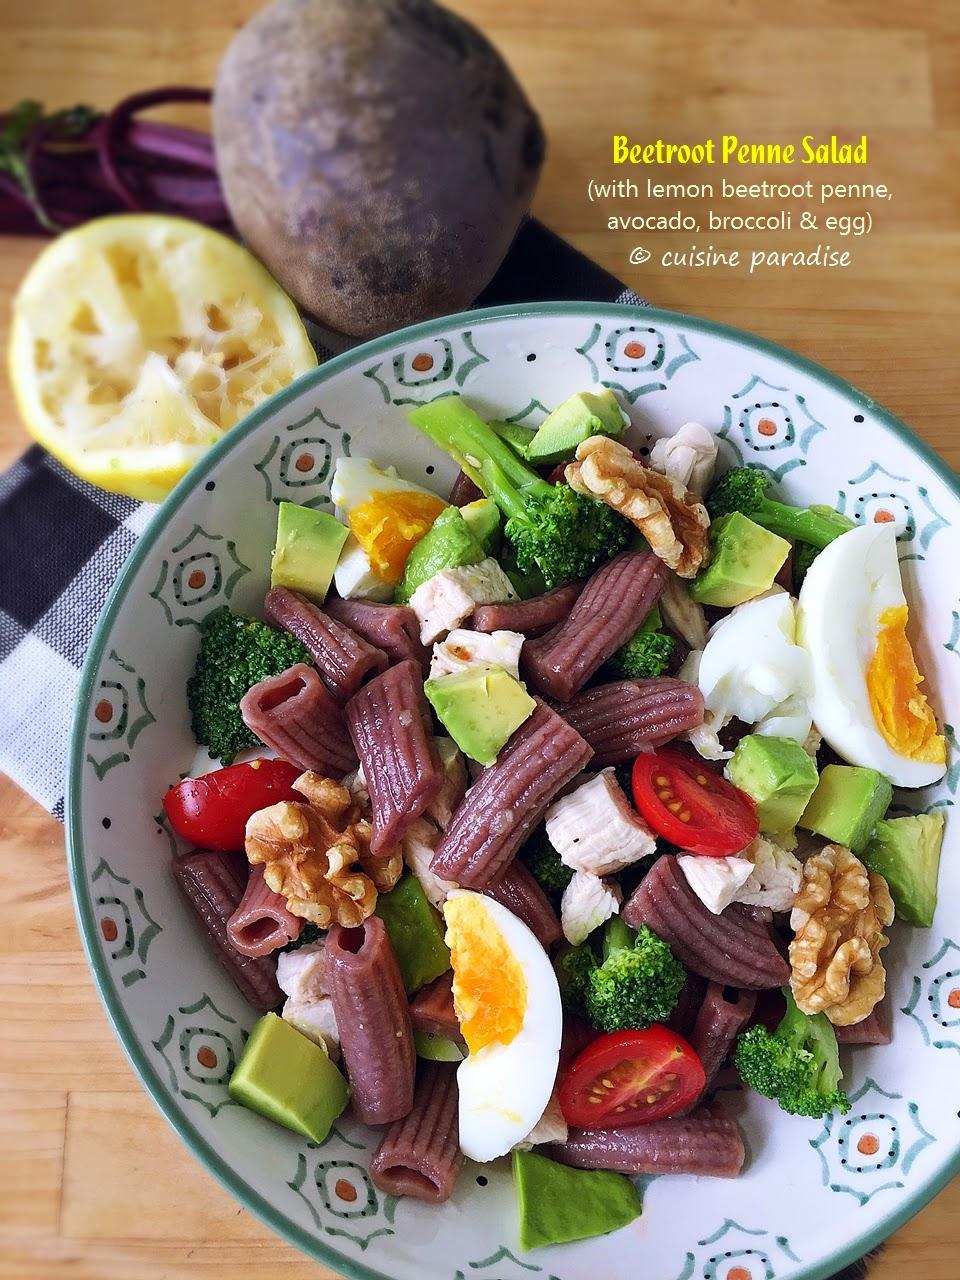 Lemon Beetroot Penne Salad